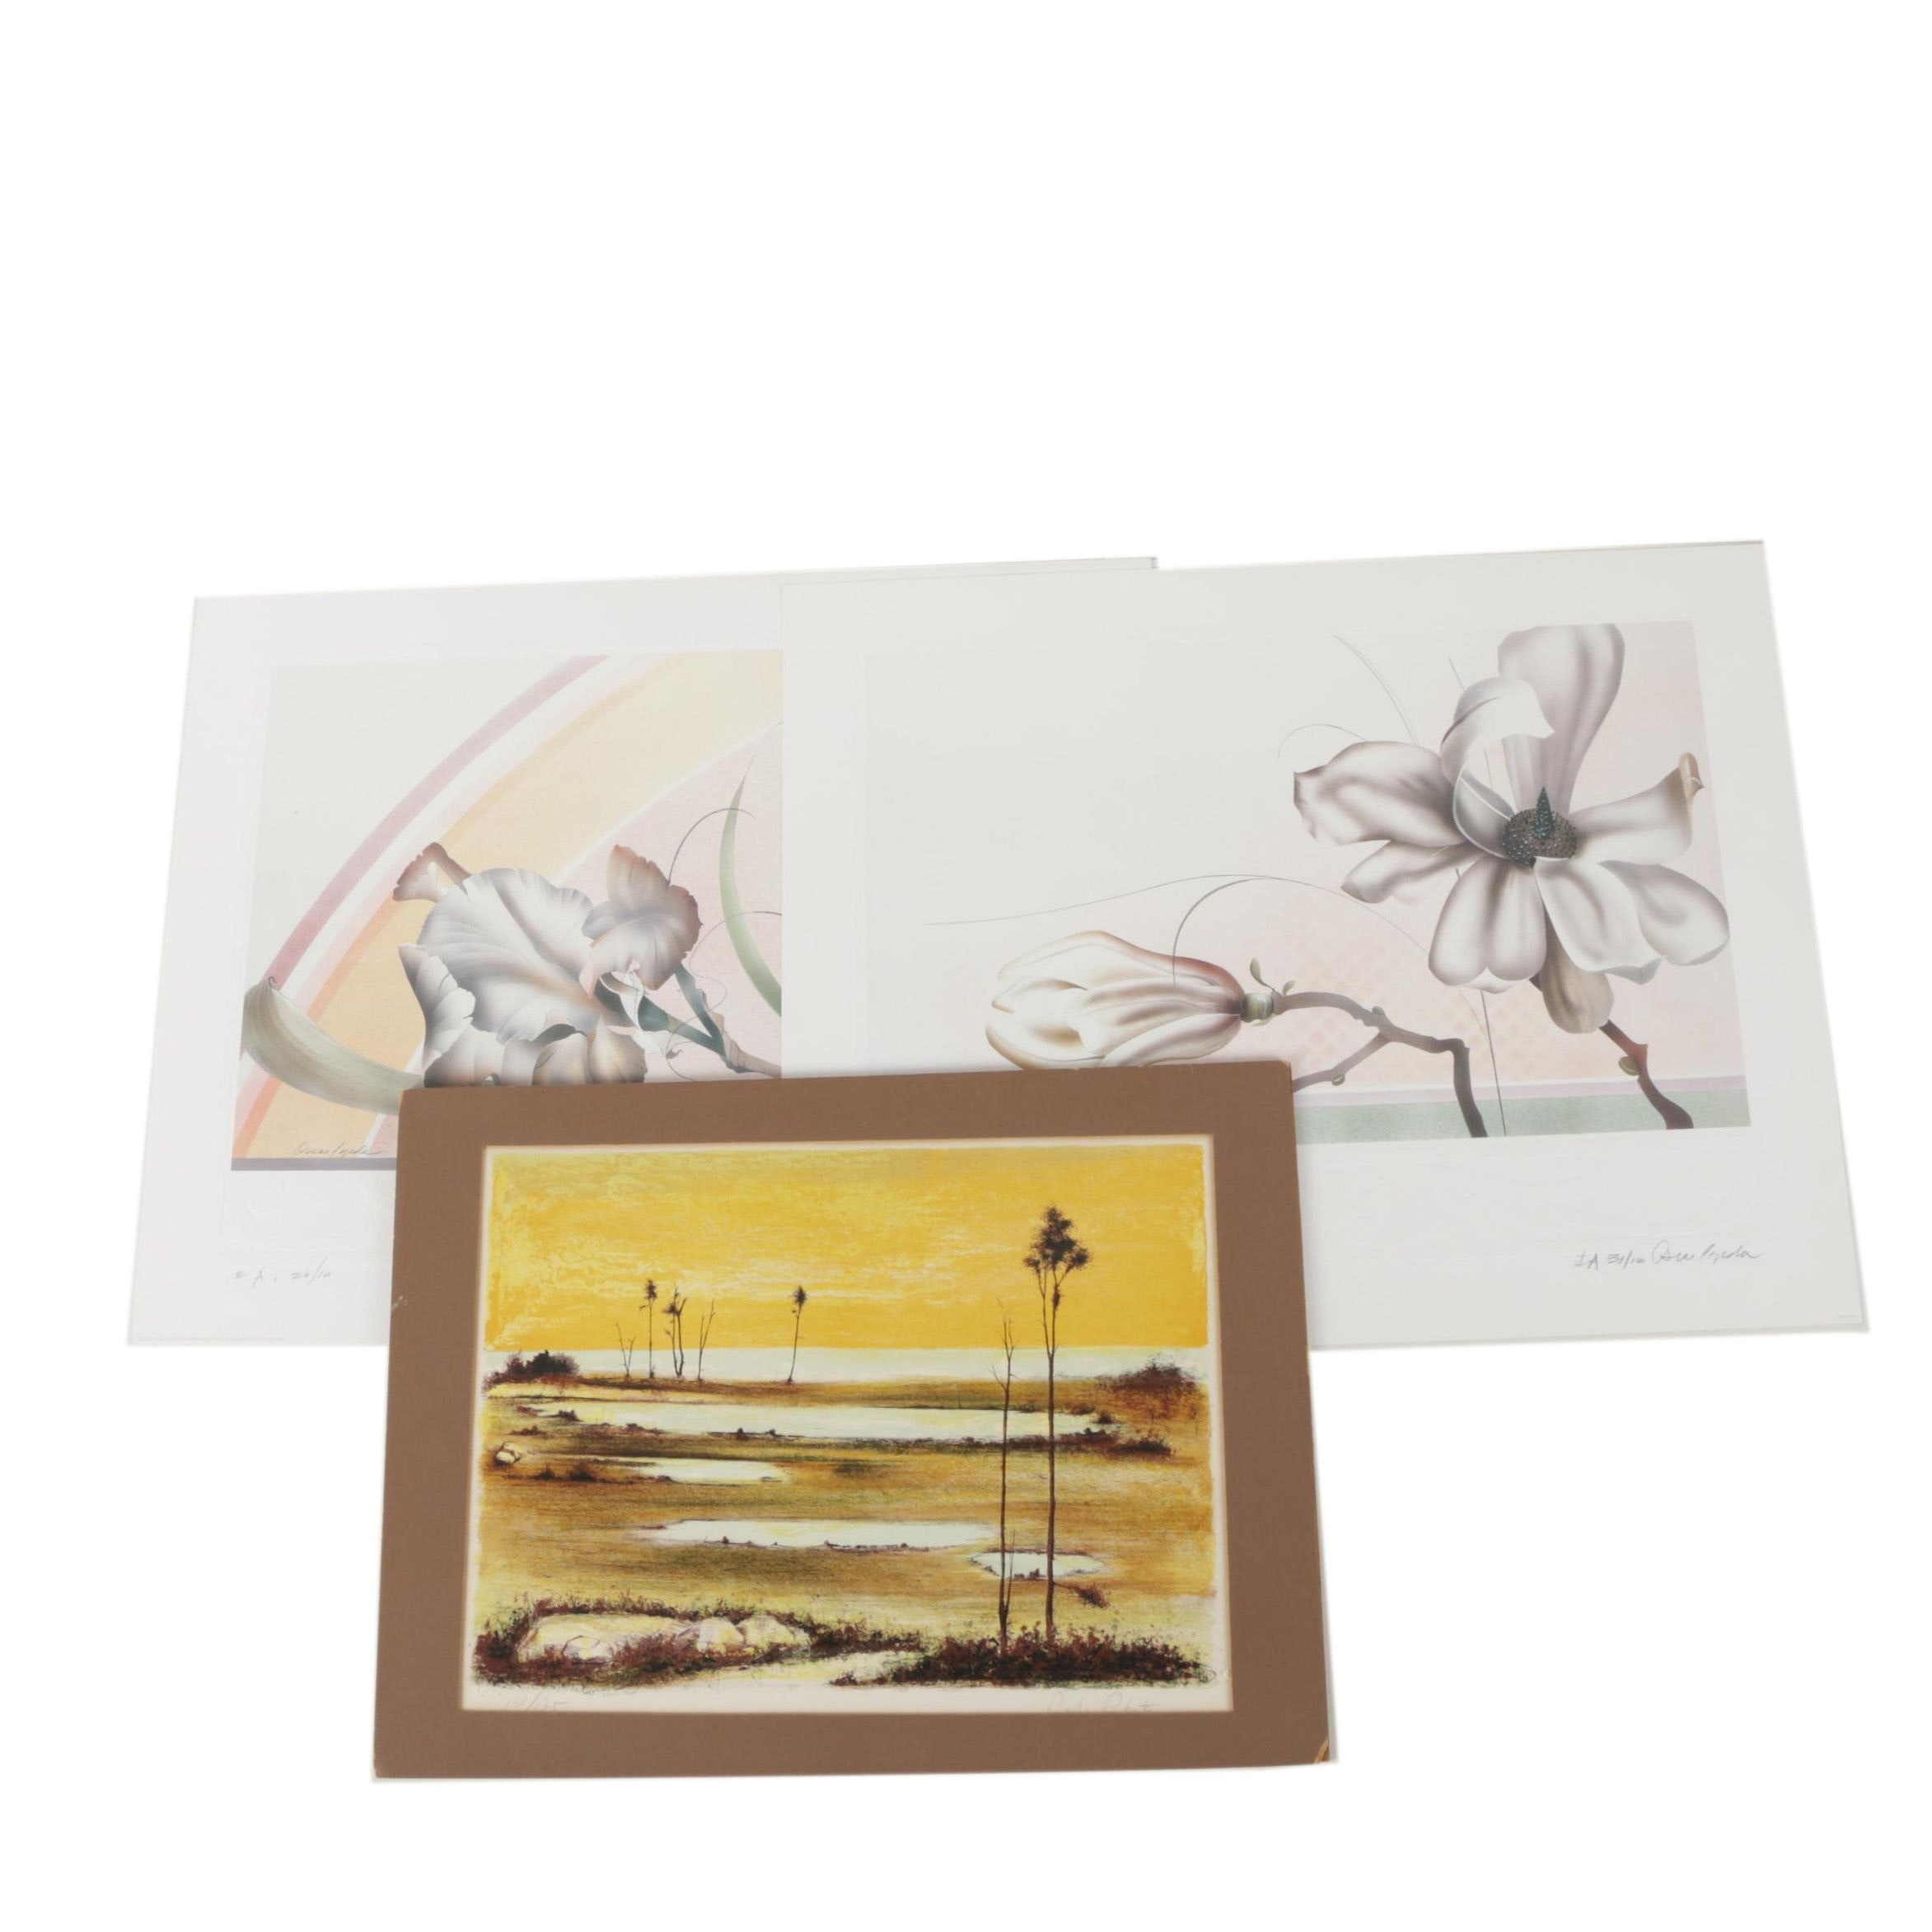 Prints of Flowers and Landscapes Including Oscar Tejada